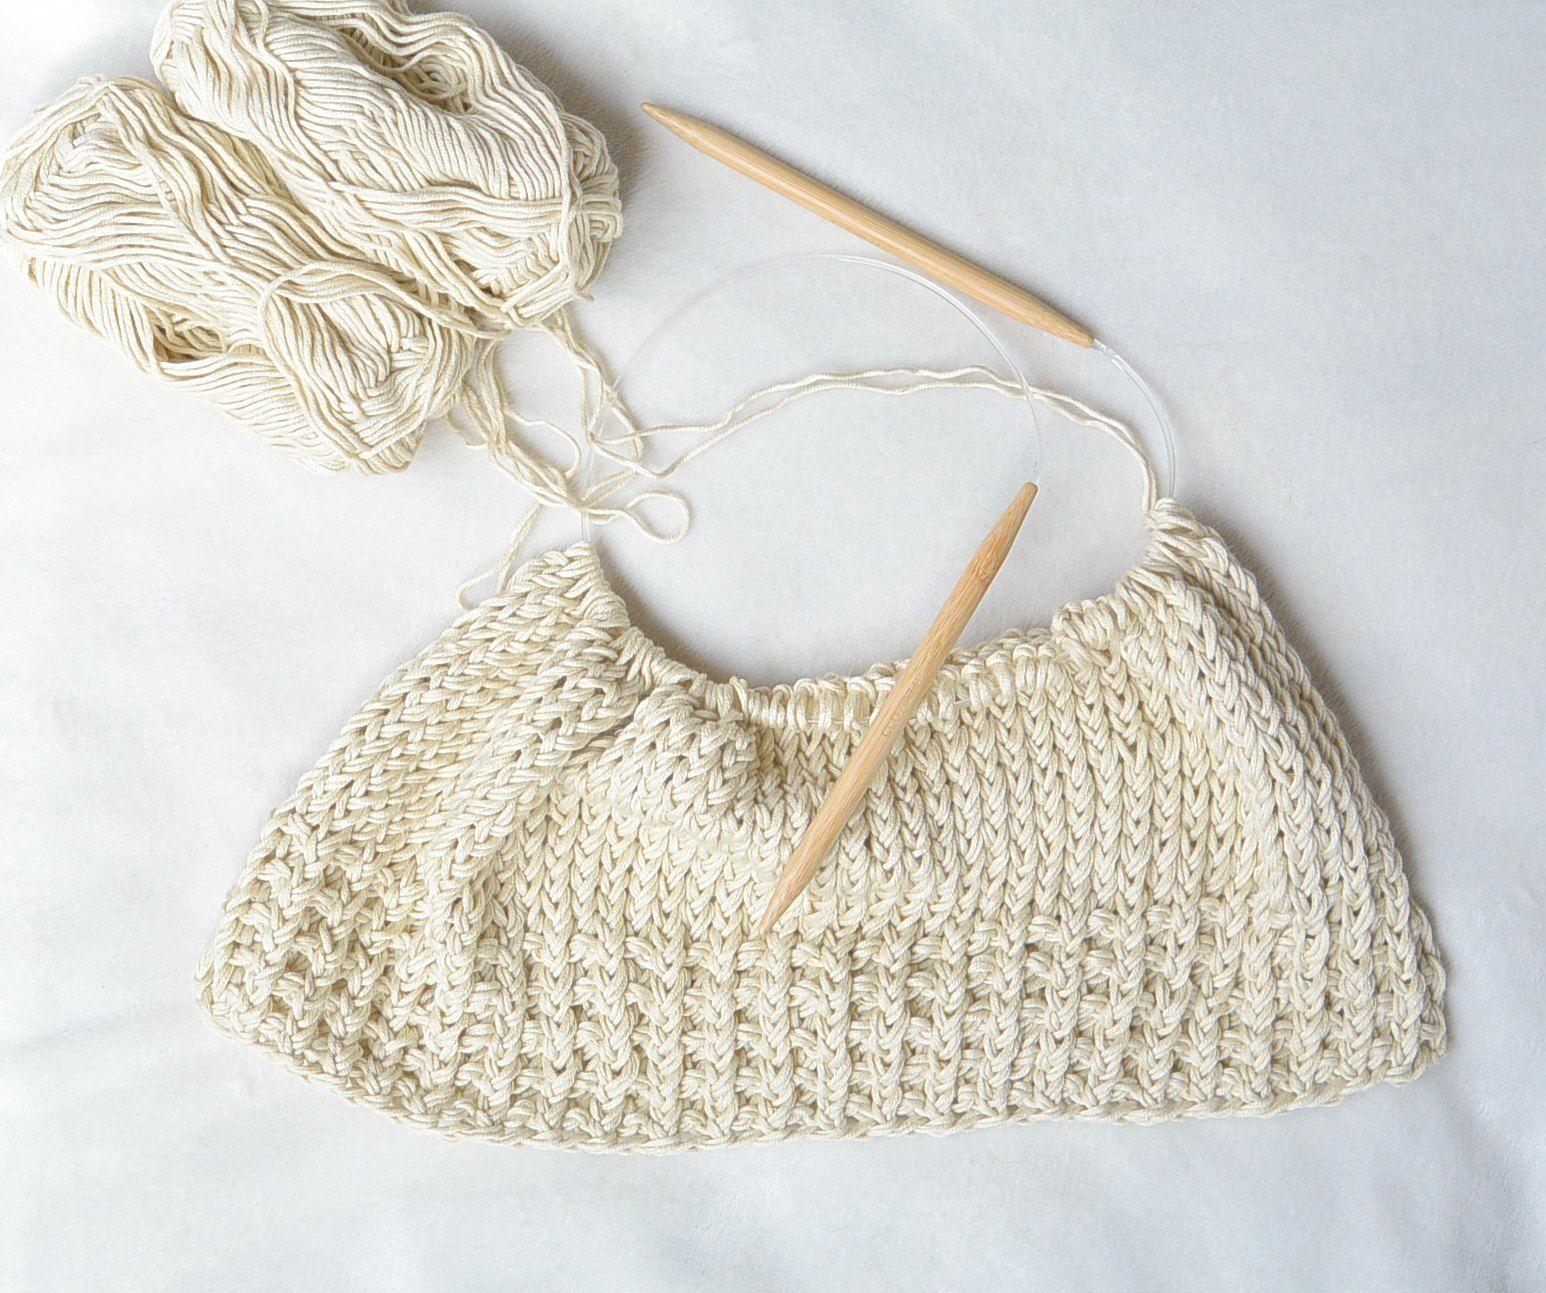 Easy Knit Top Free Pattern Progress | stuff to make | Pinterest ...